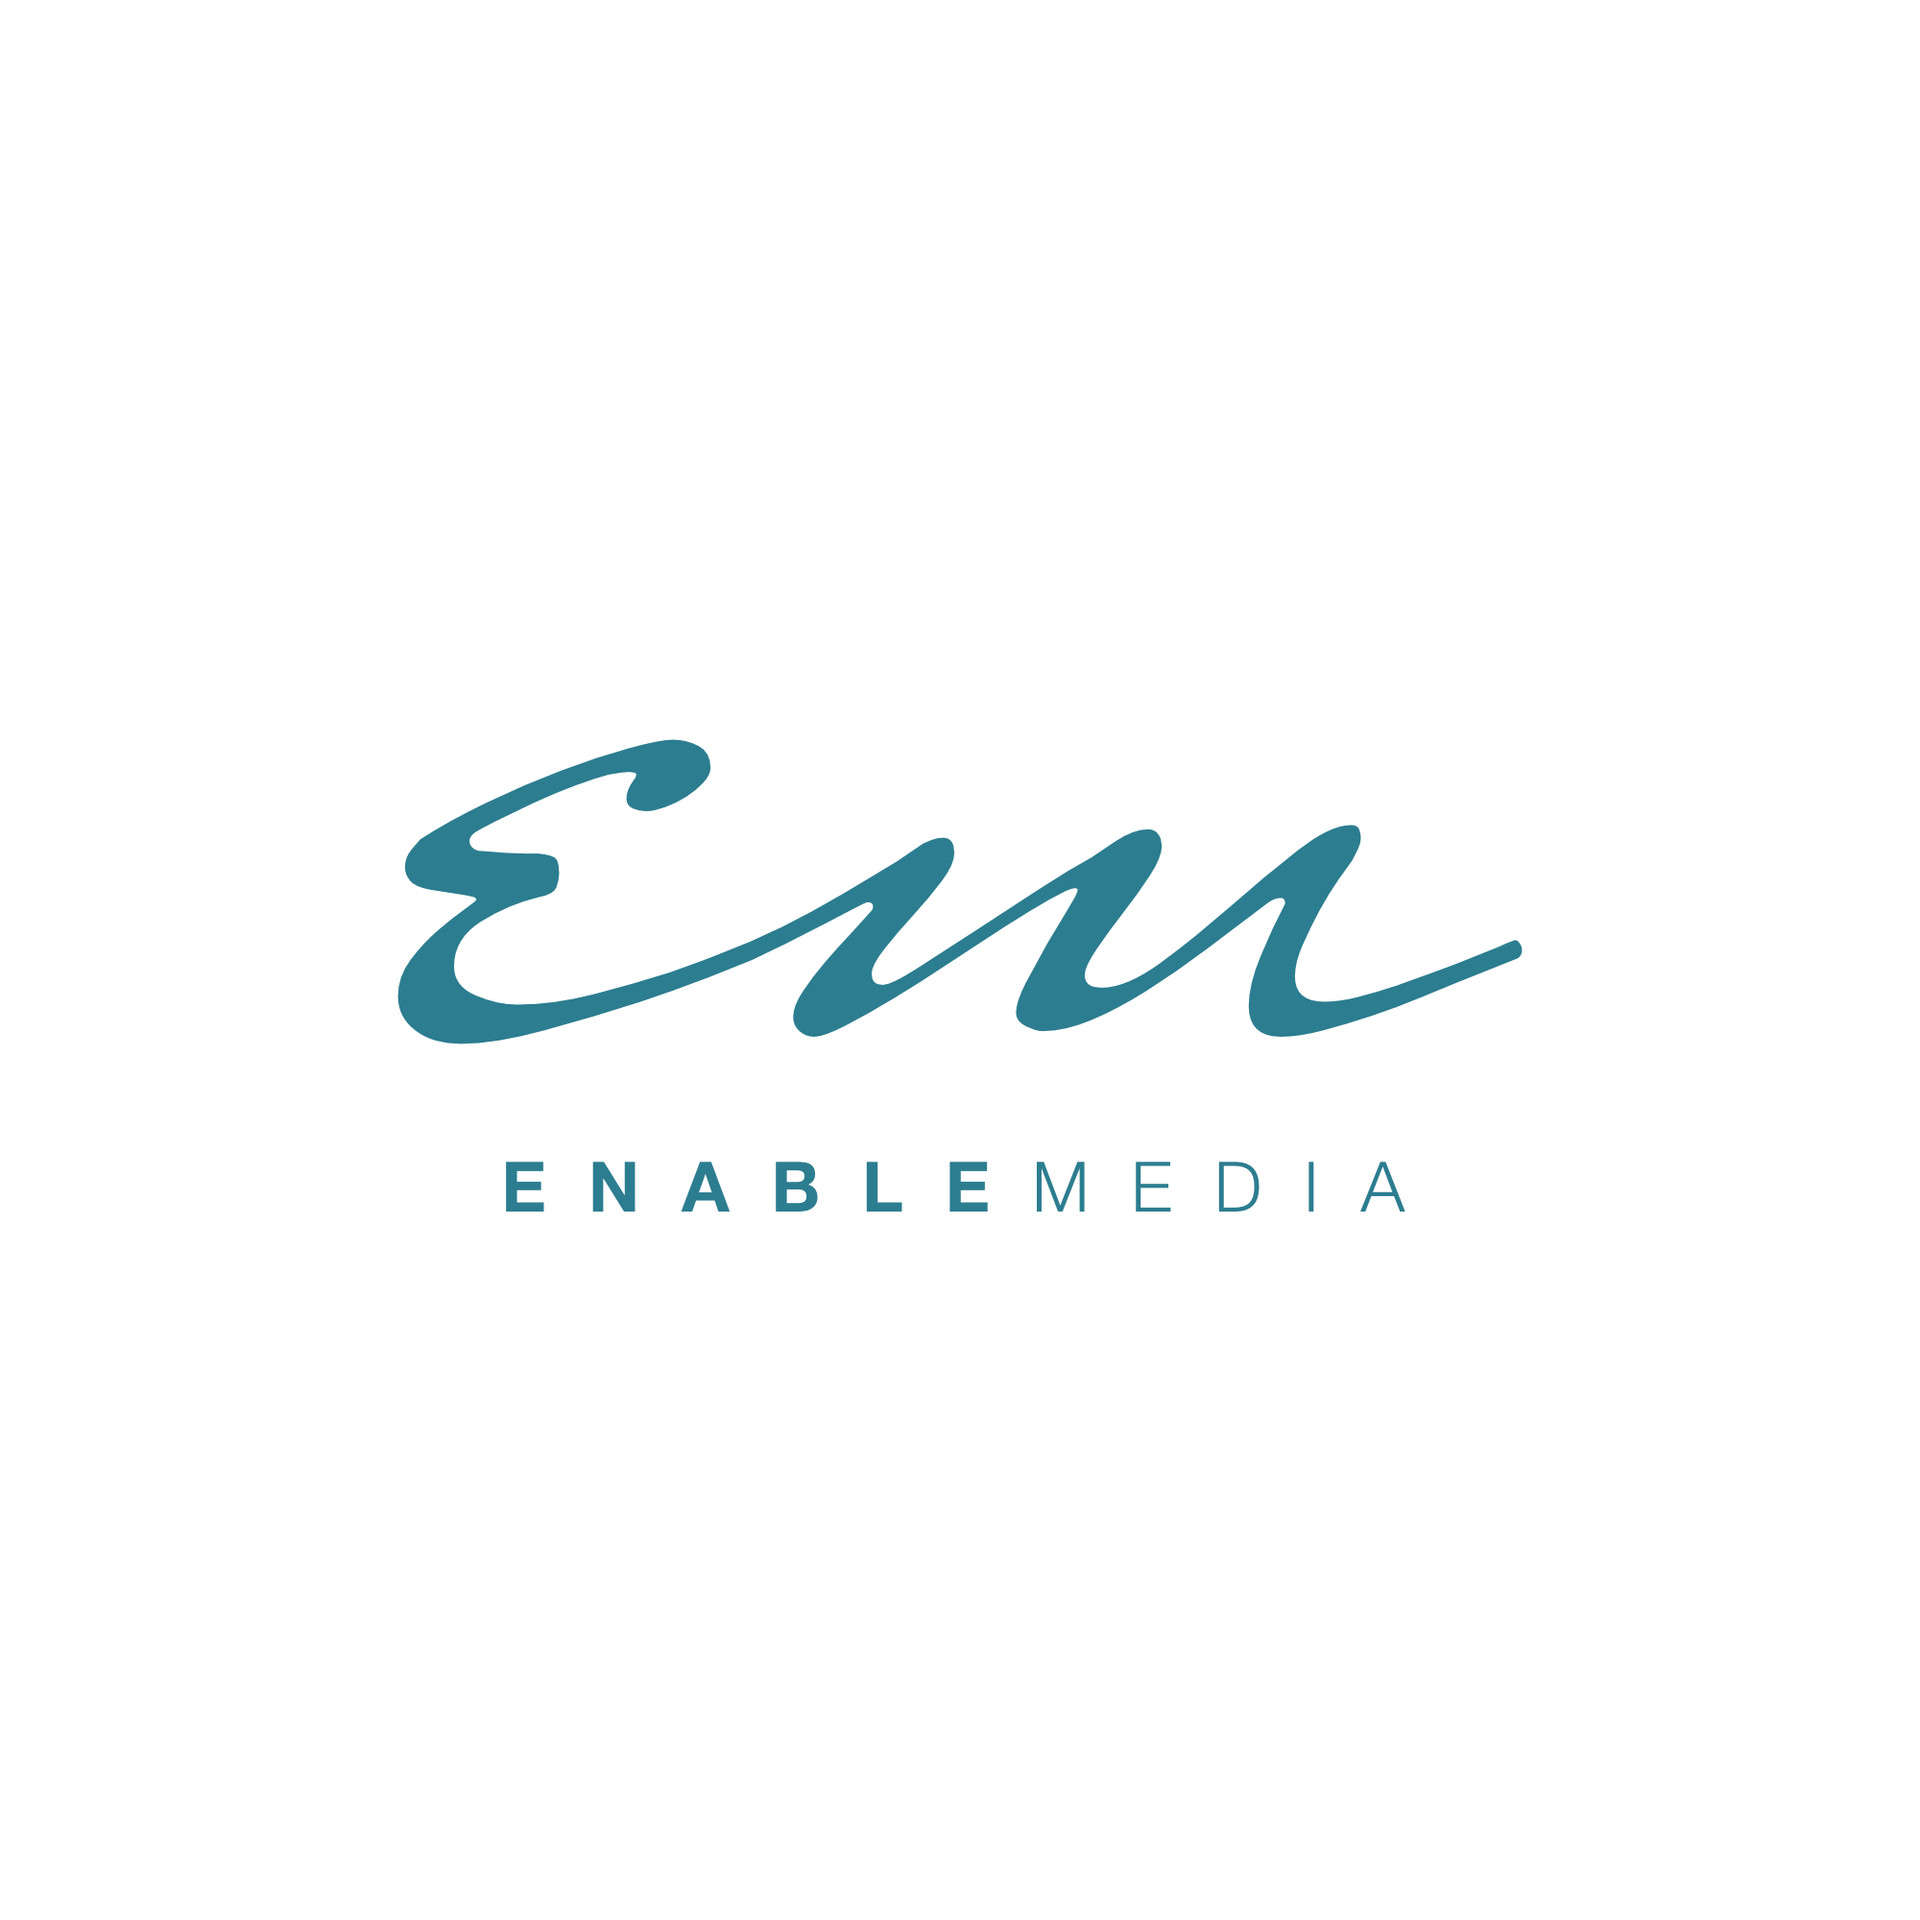 Enable Media